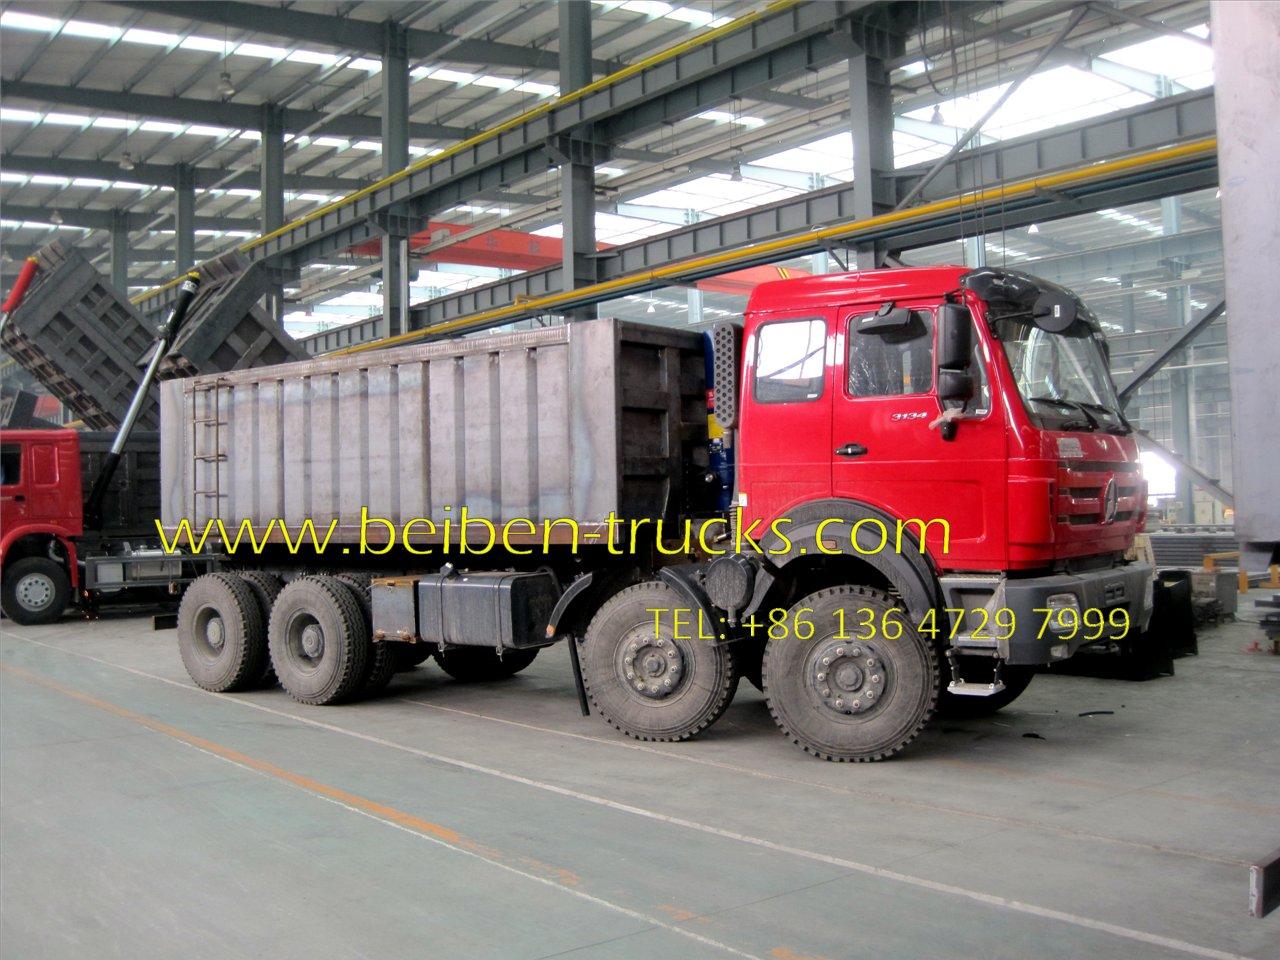 Buy Beiben 3134 Dump Truck,Beiben 3134 Dump Truck